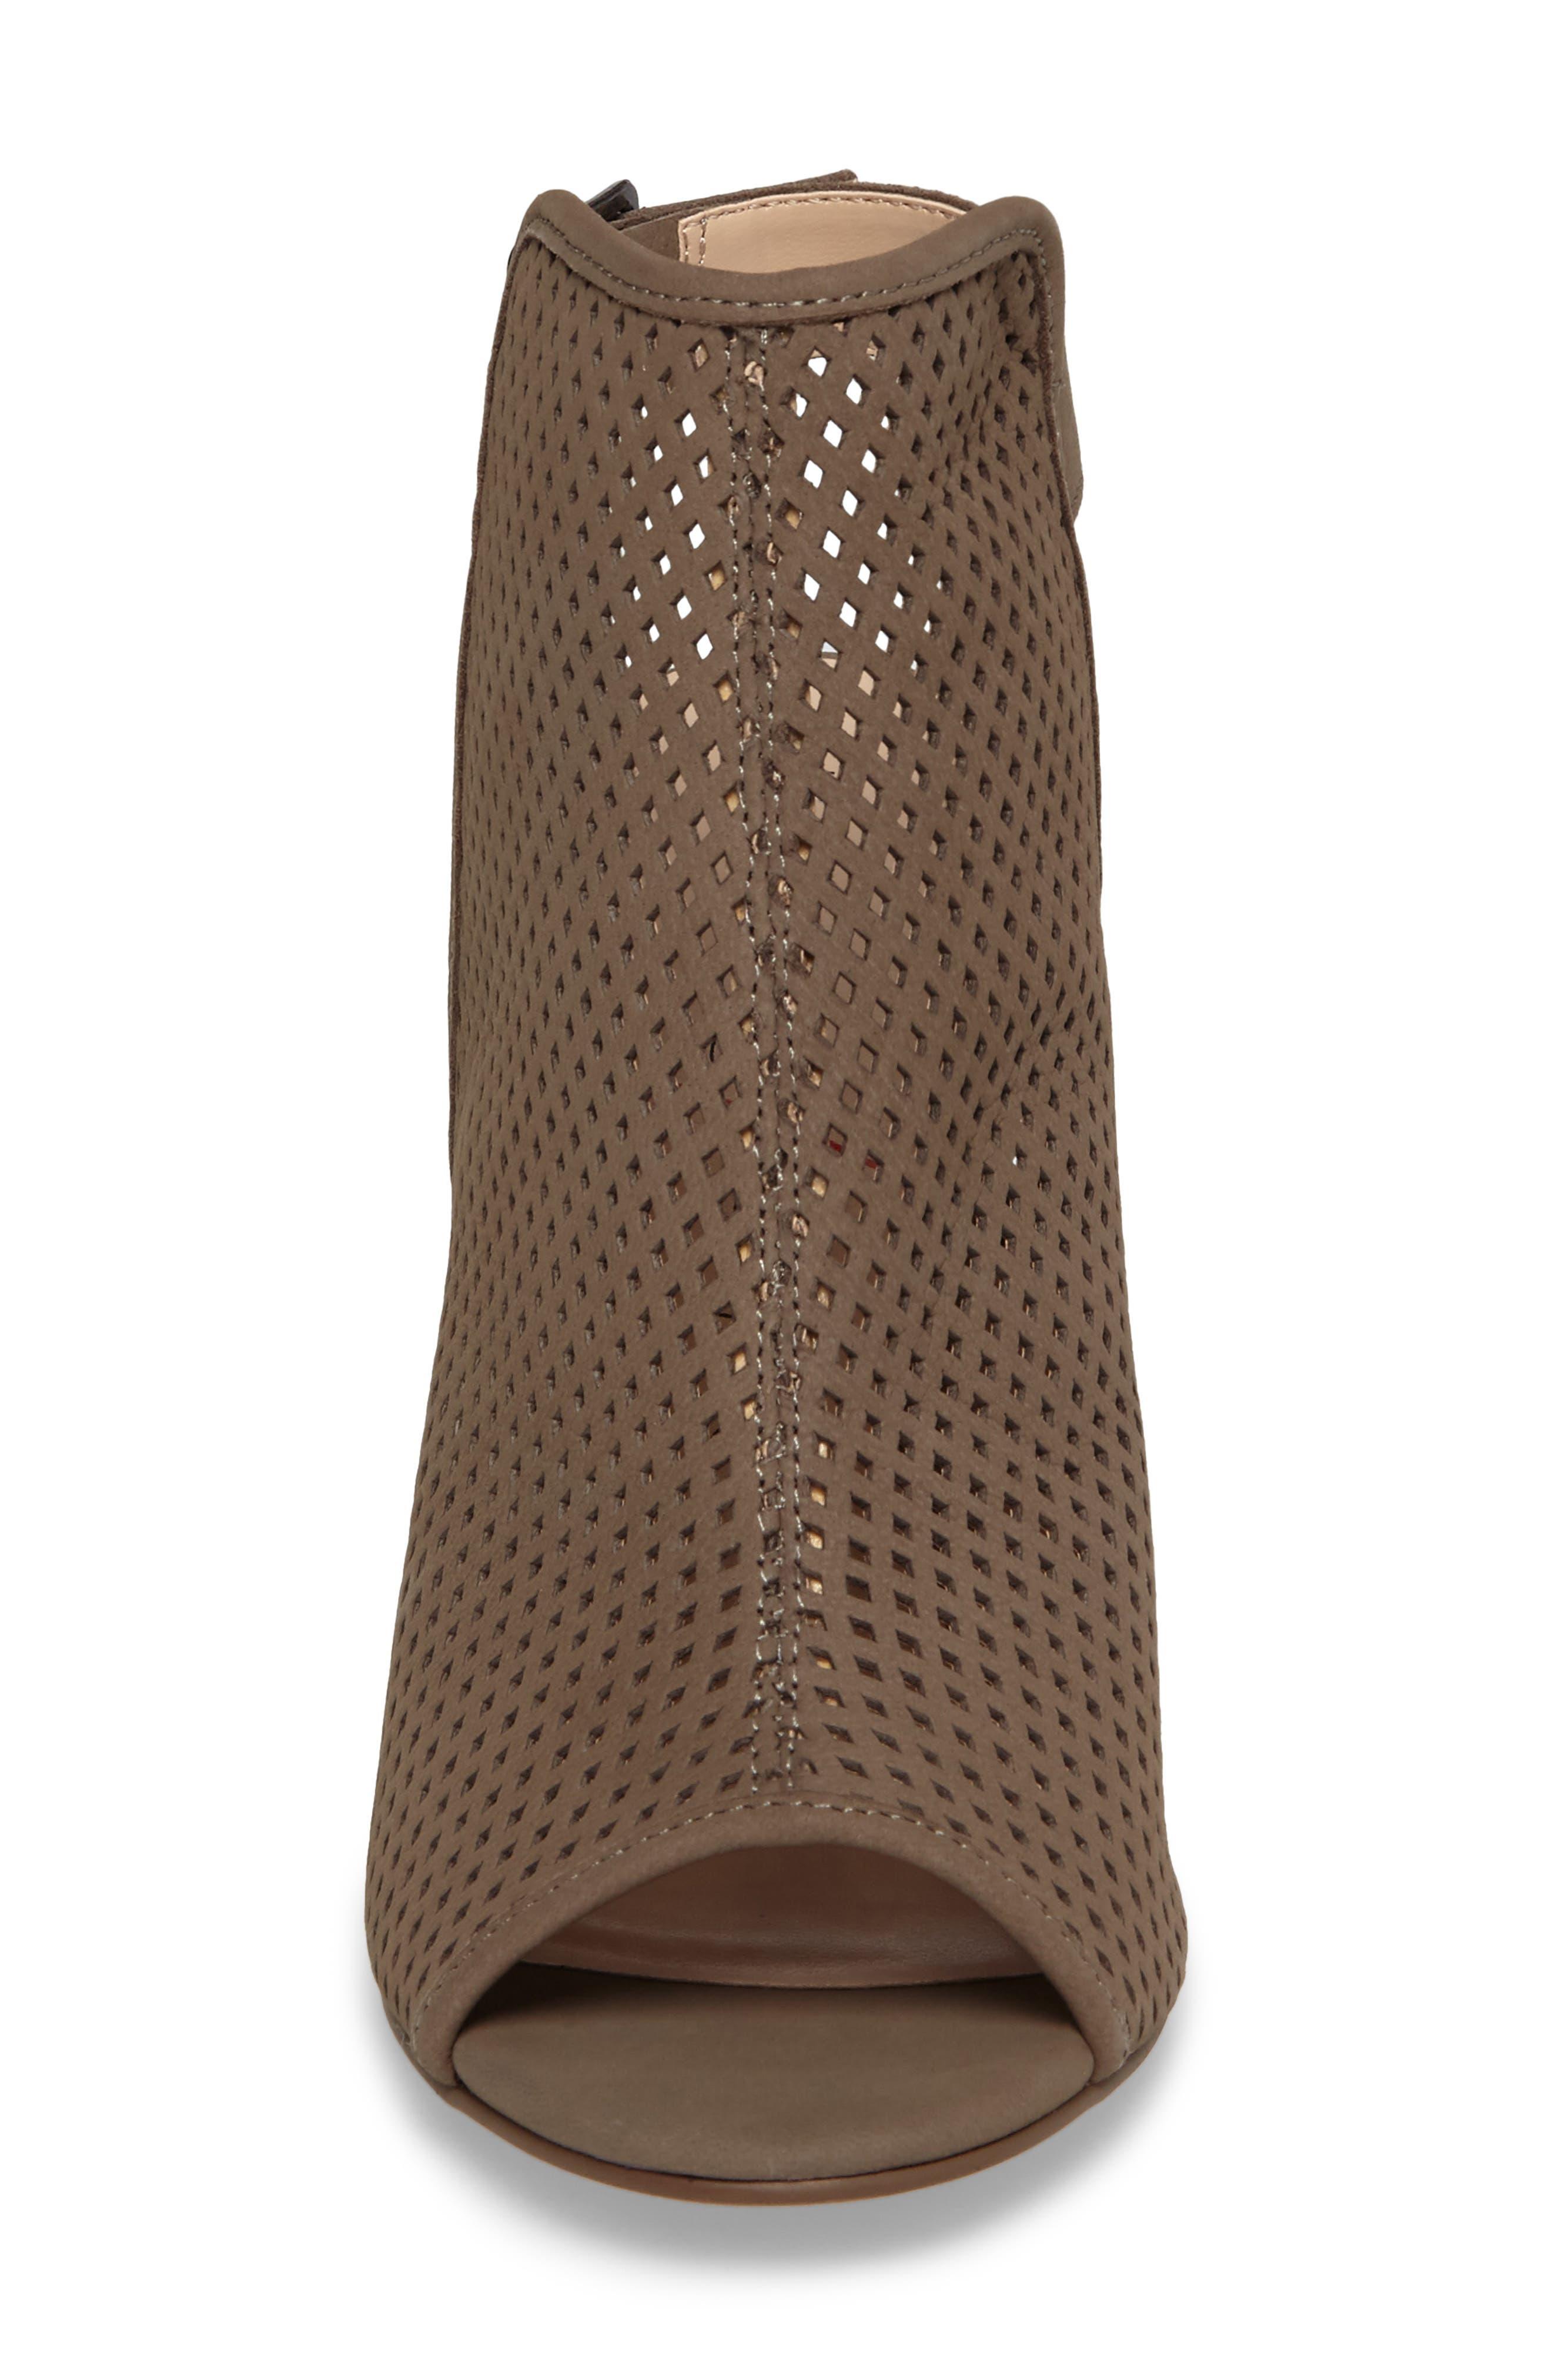 Bombay Perforated Sandal,                             Alternate thumbnail 4, color,                             Mushroom